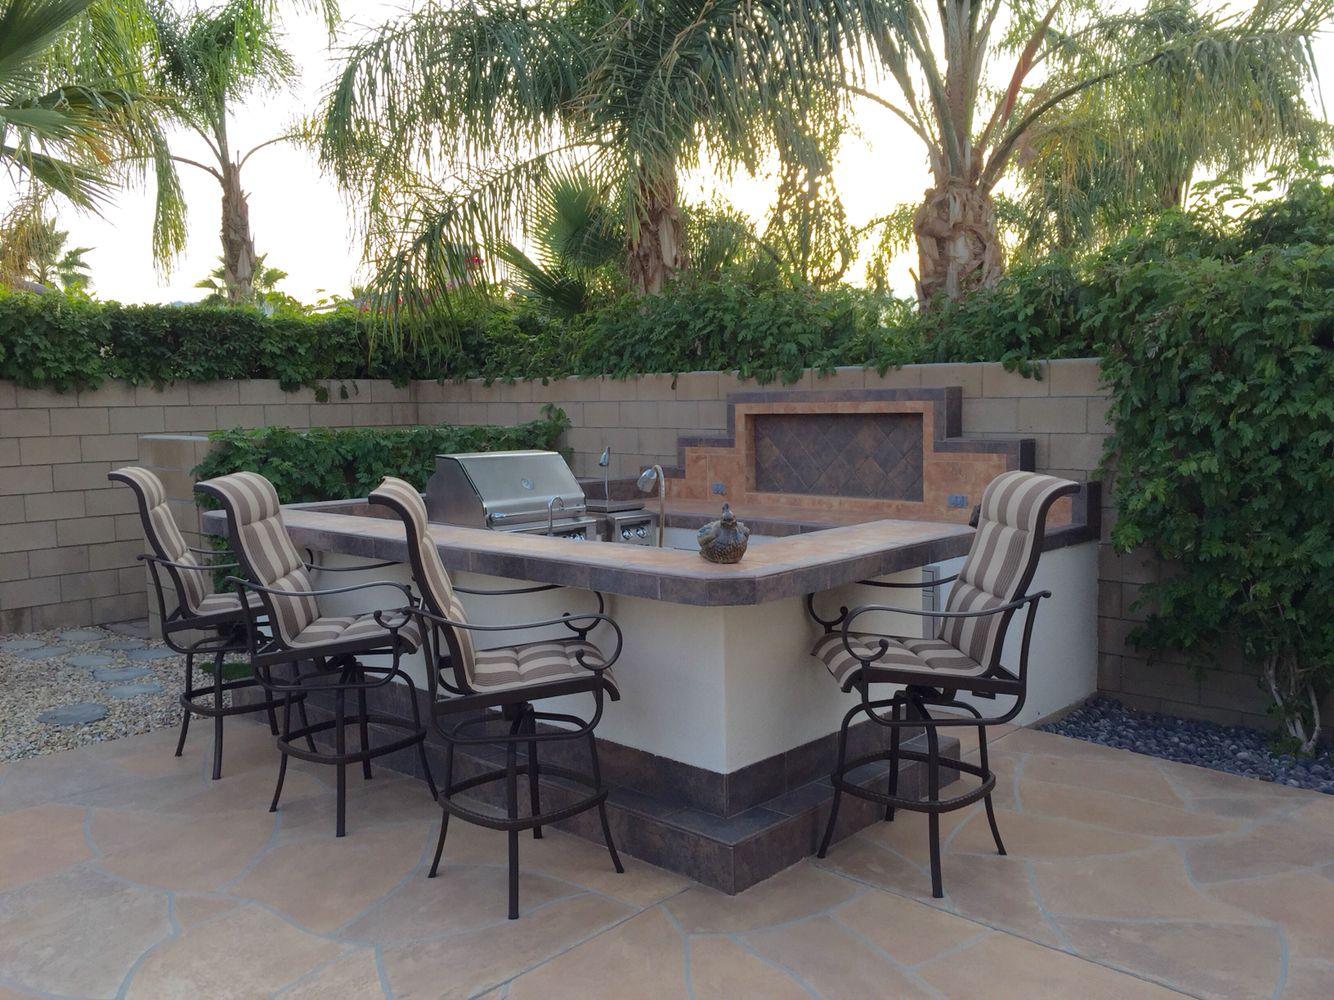 Outdoor kitchen outdoor kitchen pool designs outdoor